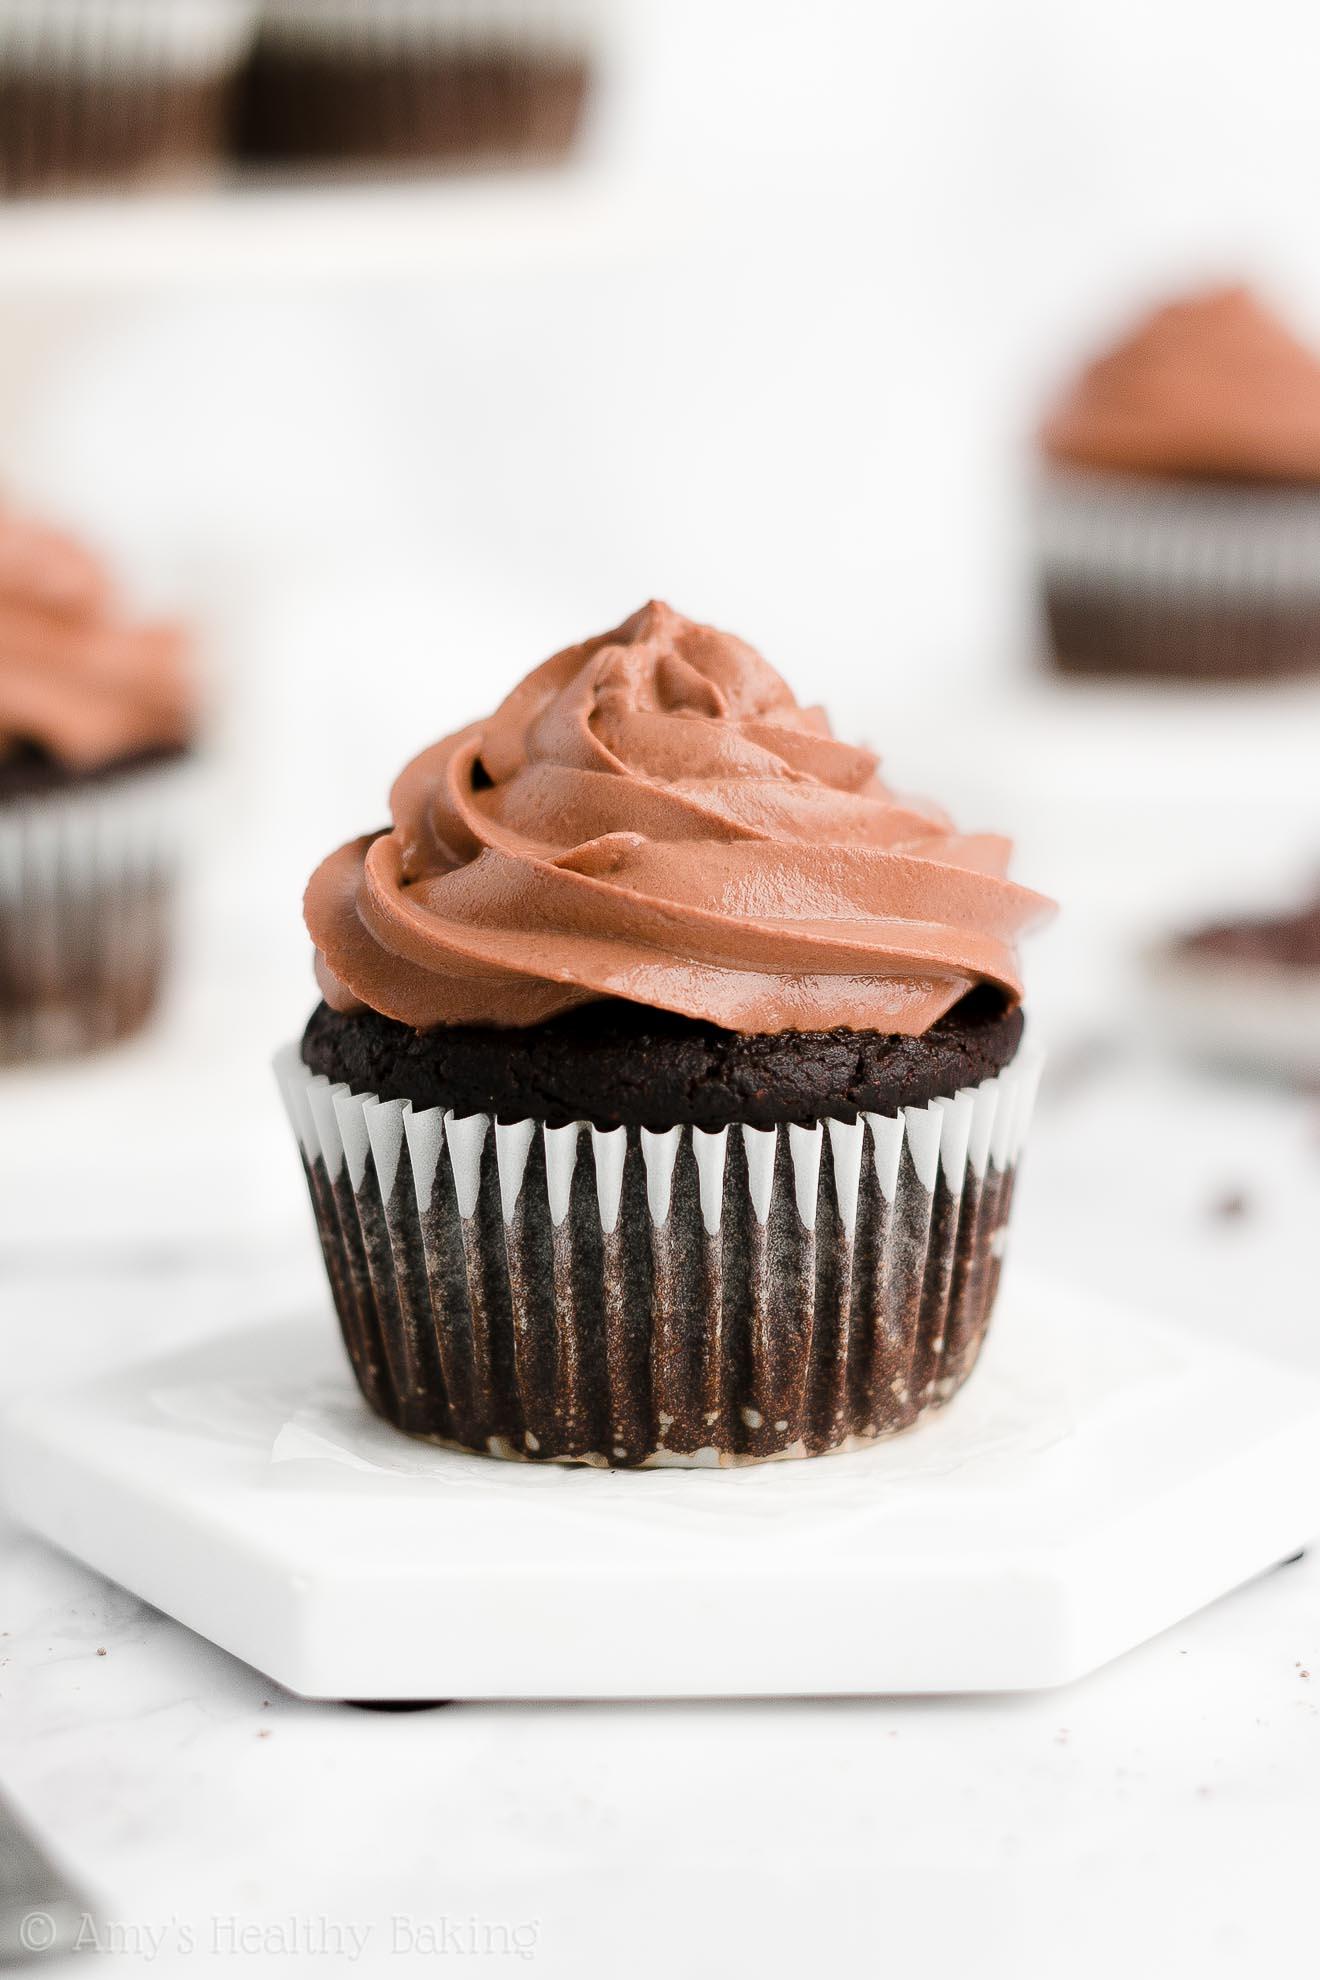 Best Easy Healthy Super Moist One-Bowl Greek Yogurt Dark Chocolate Cupcakes